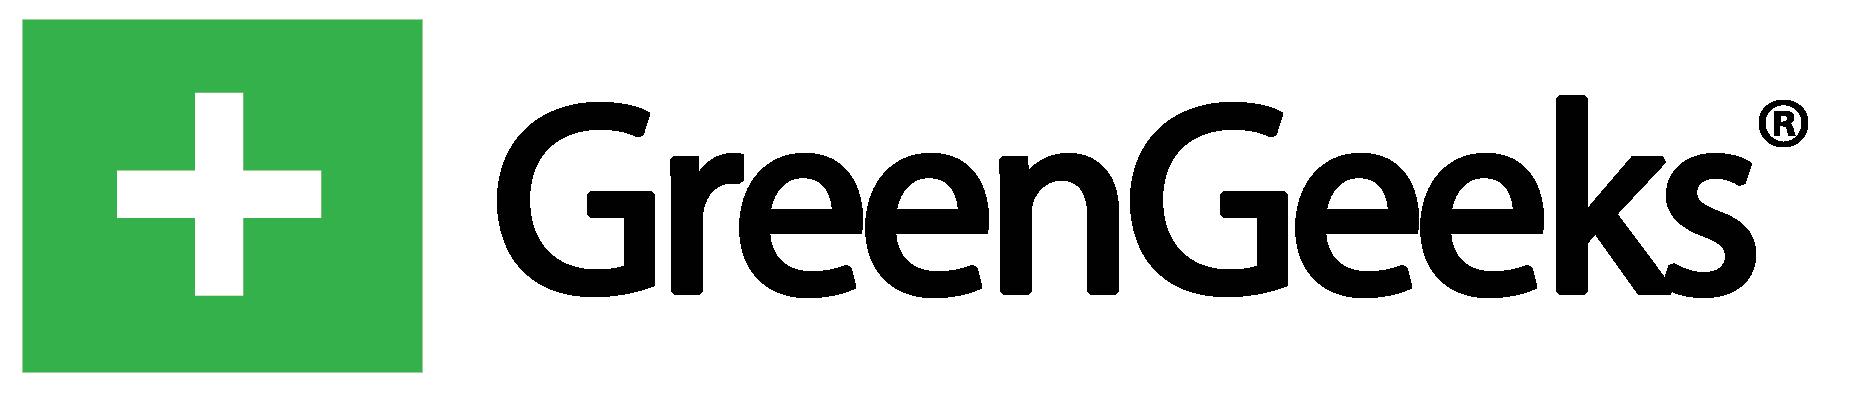 greengeeks hosting logo image